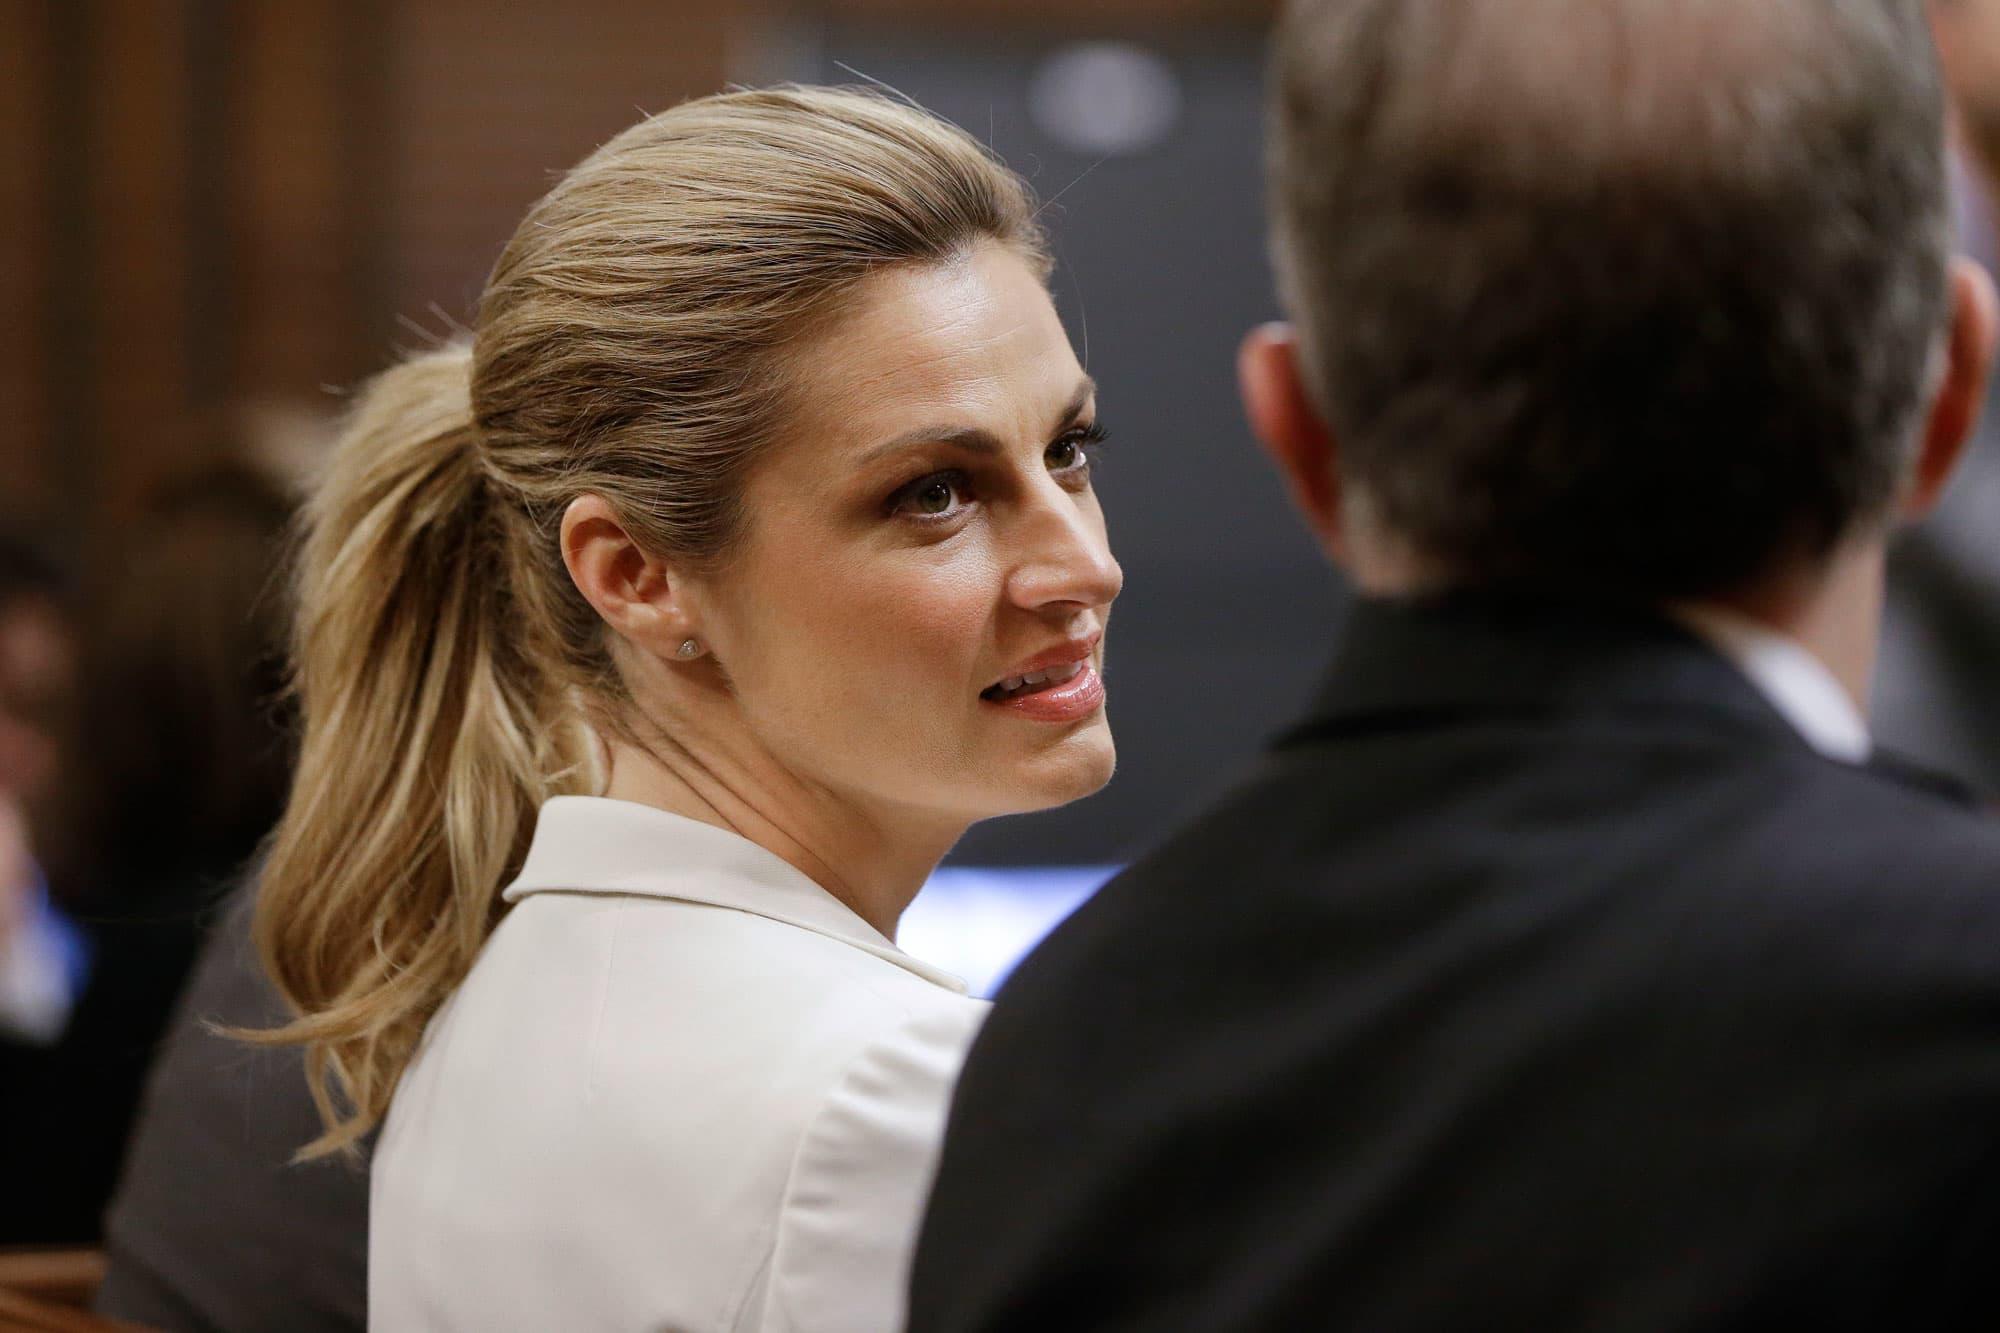 Jury Awards Erin Andrews 55 Million Over Nude Video-6720